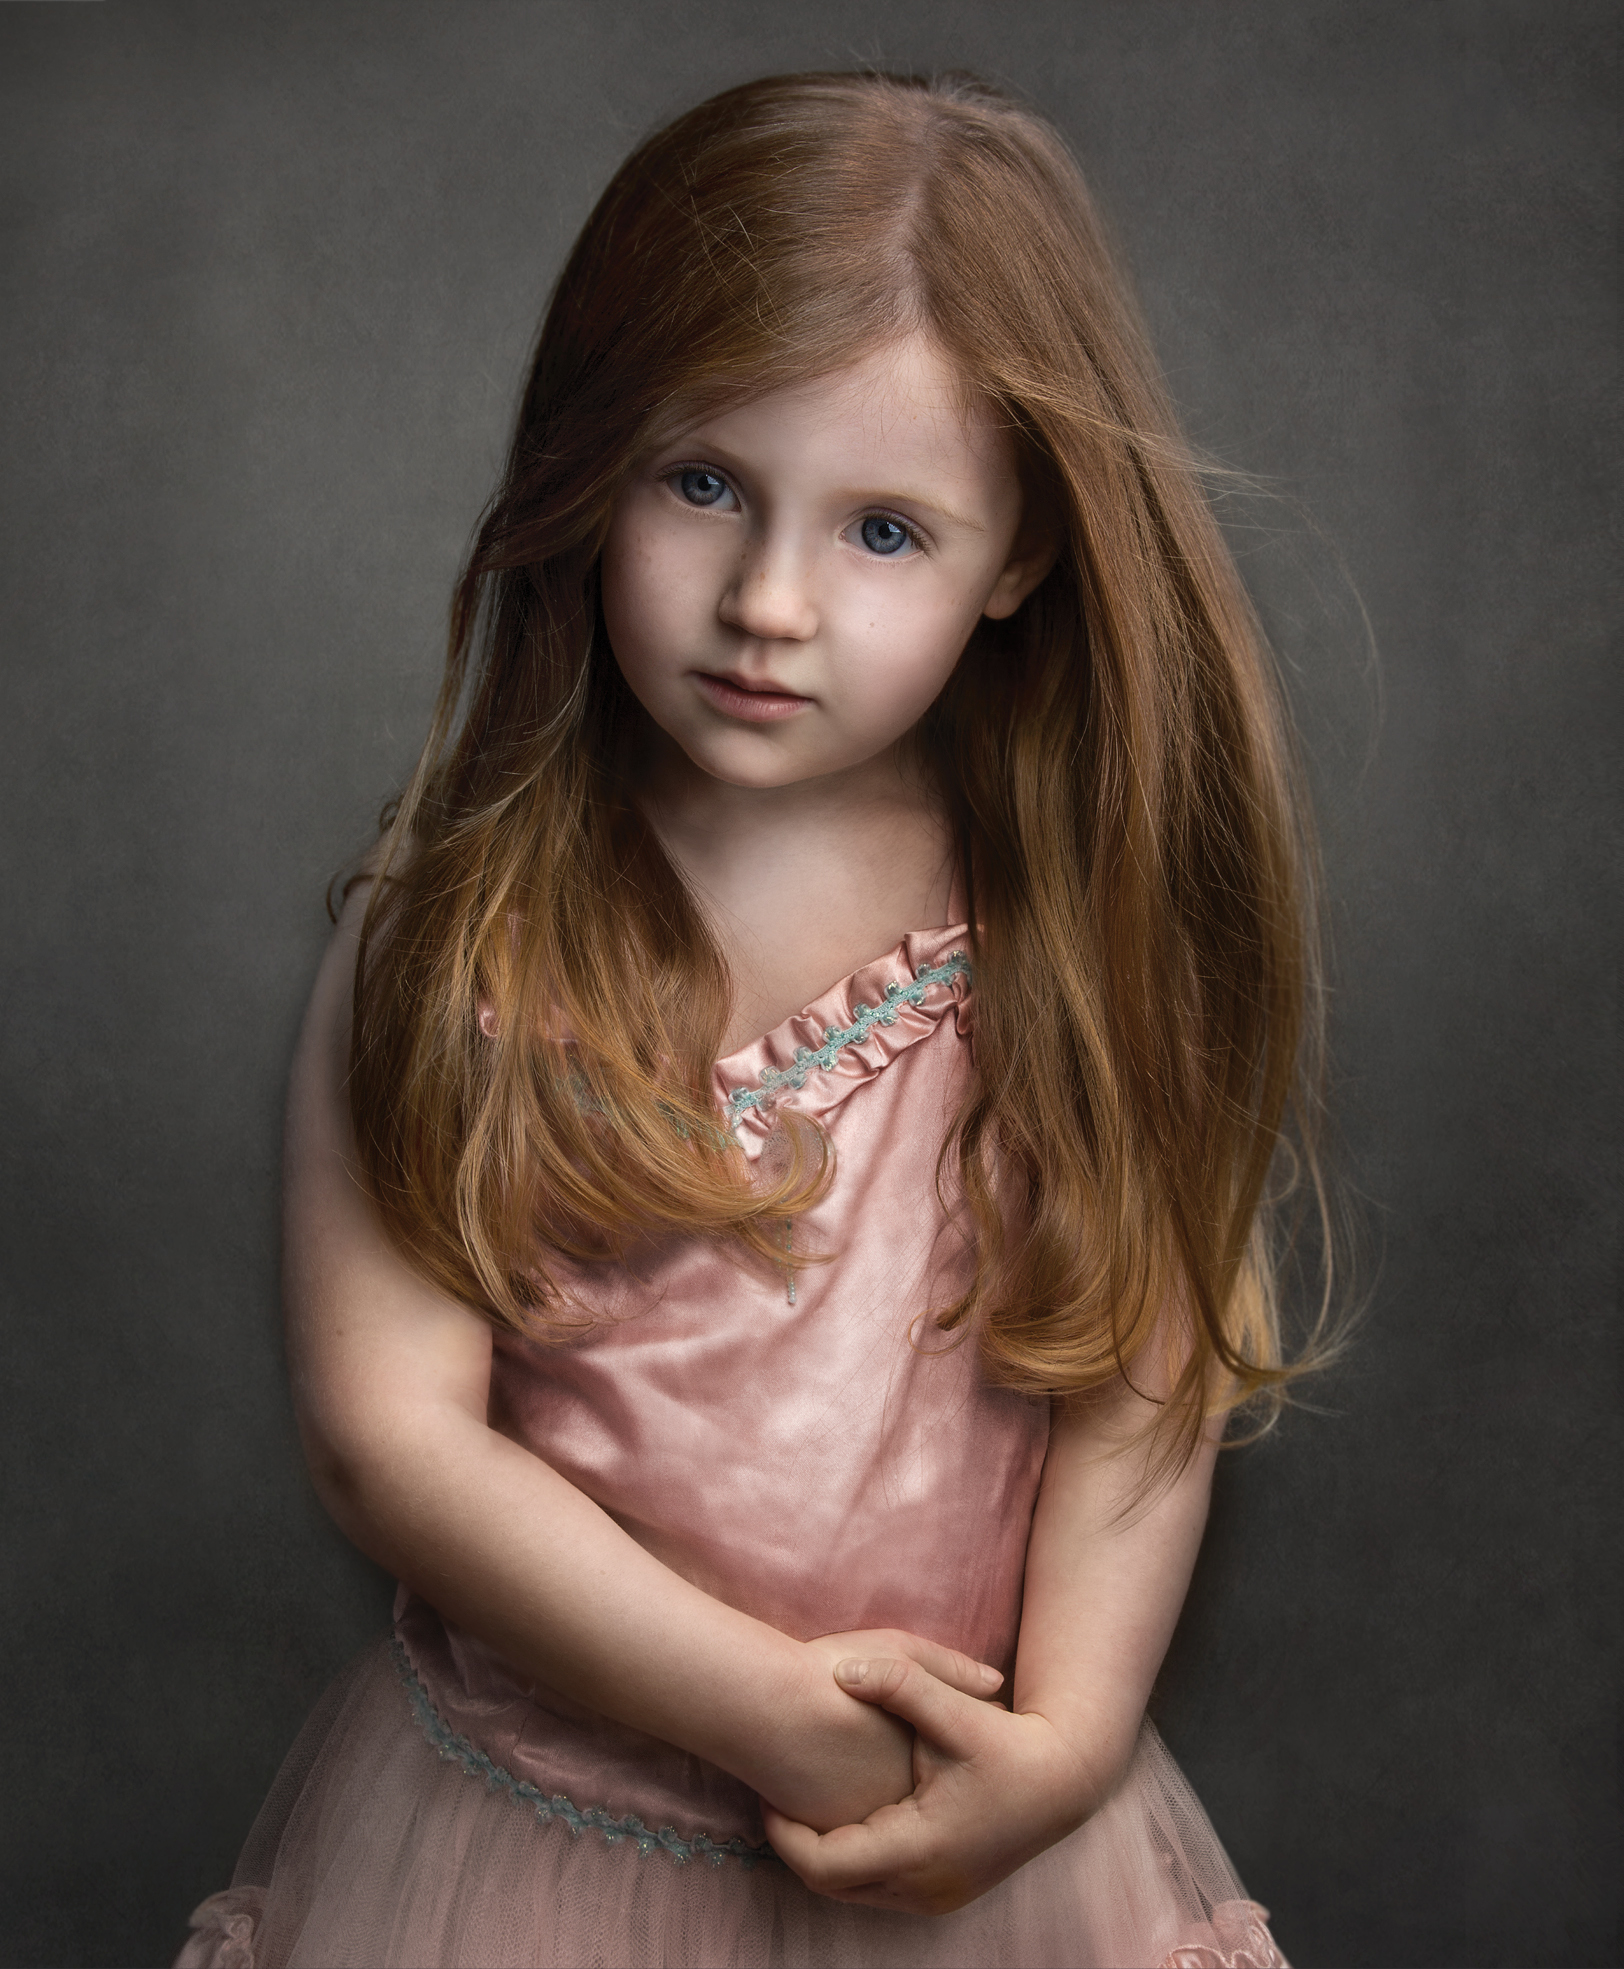 FIne-Art-Child-Portraits-2.jpg